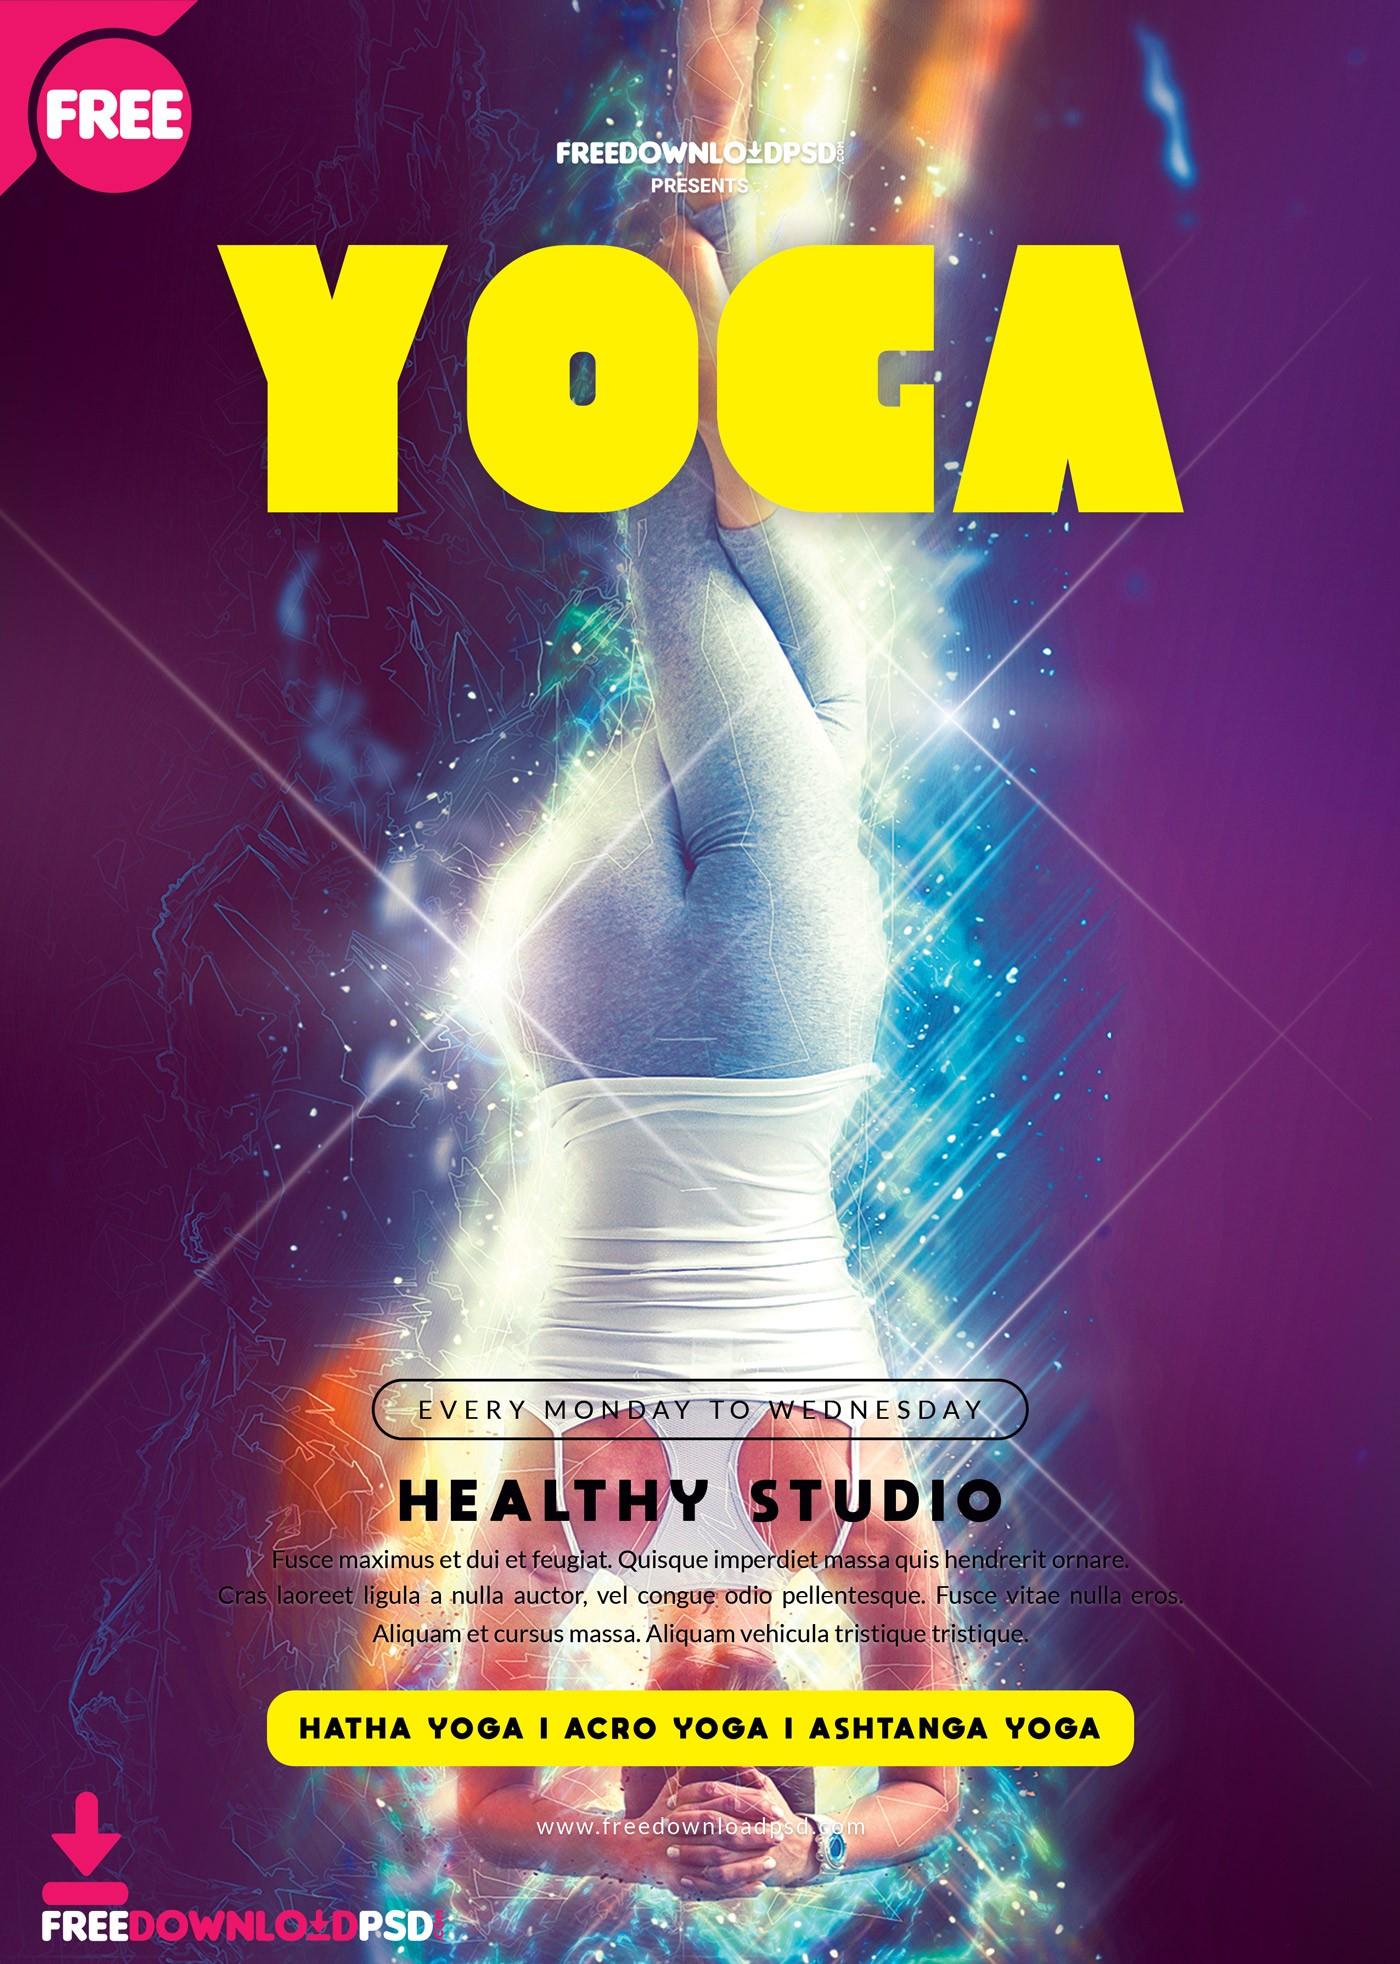 Free Yoga Flyer Template Psd Psdflyer